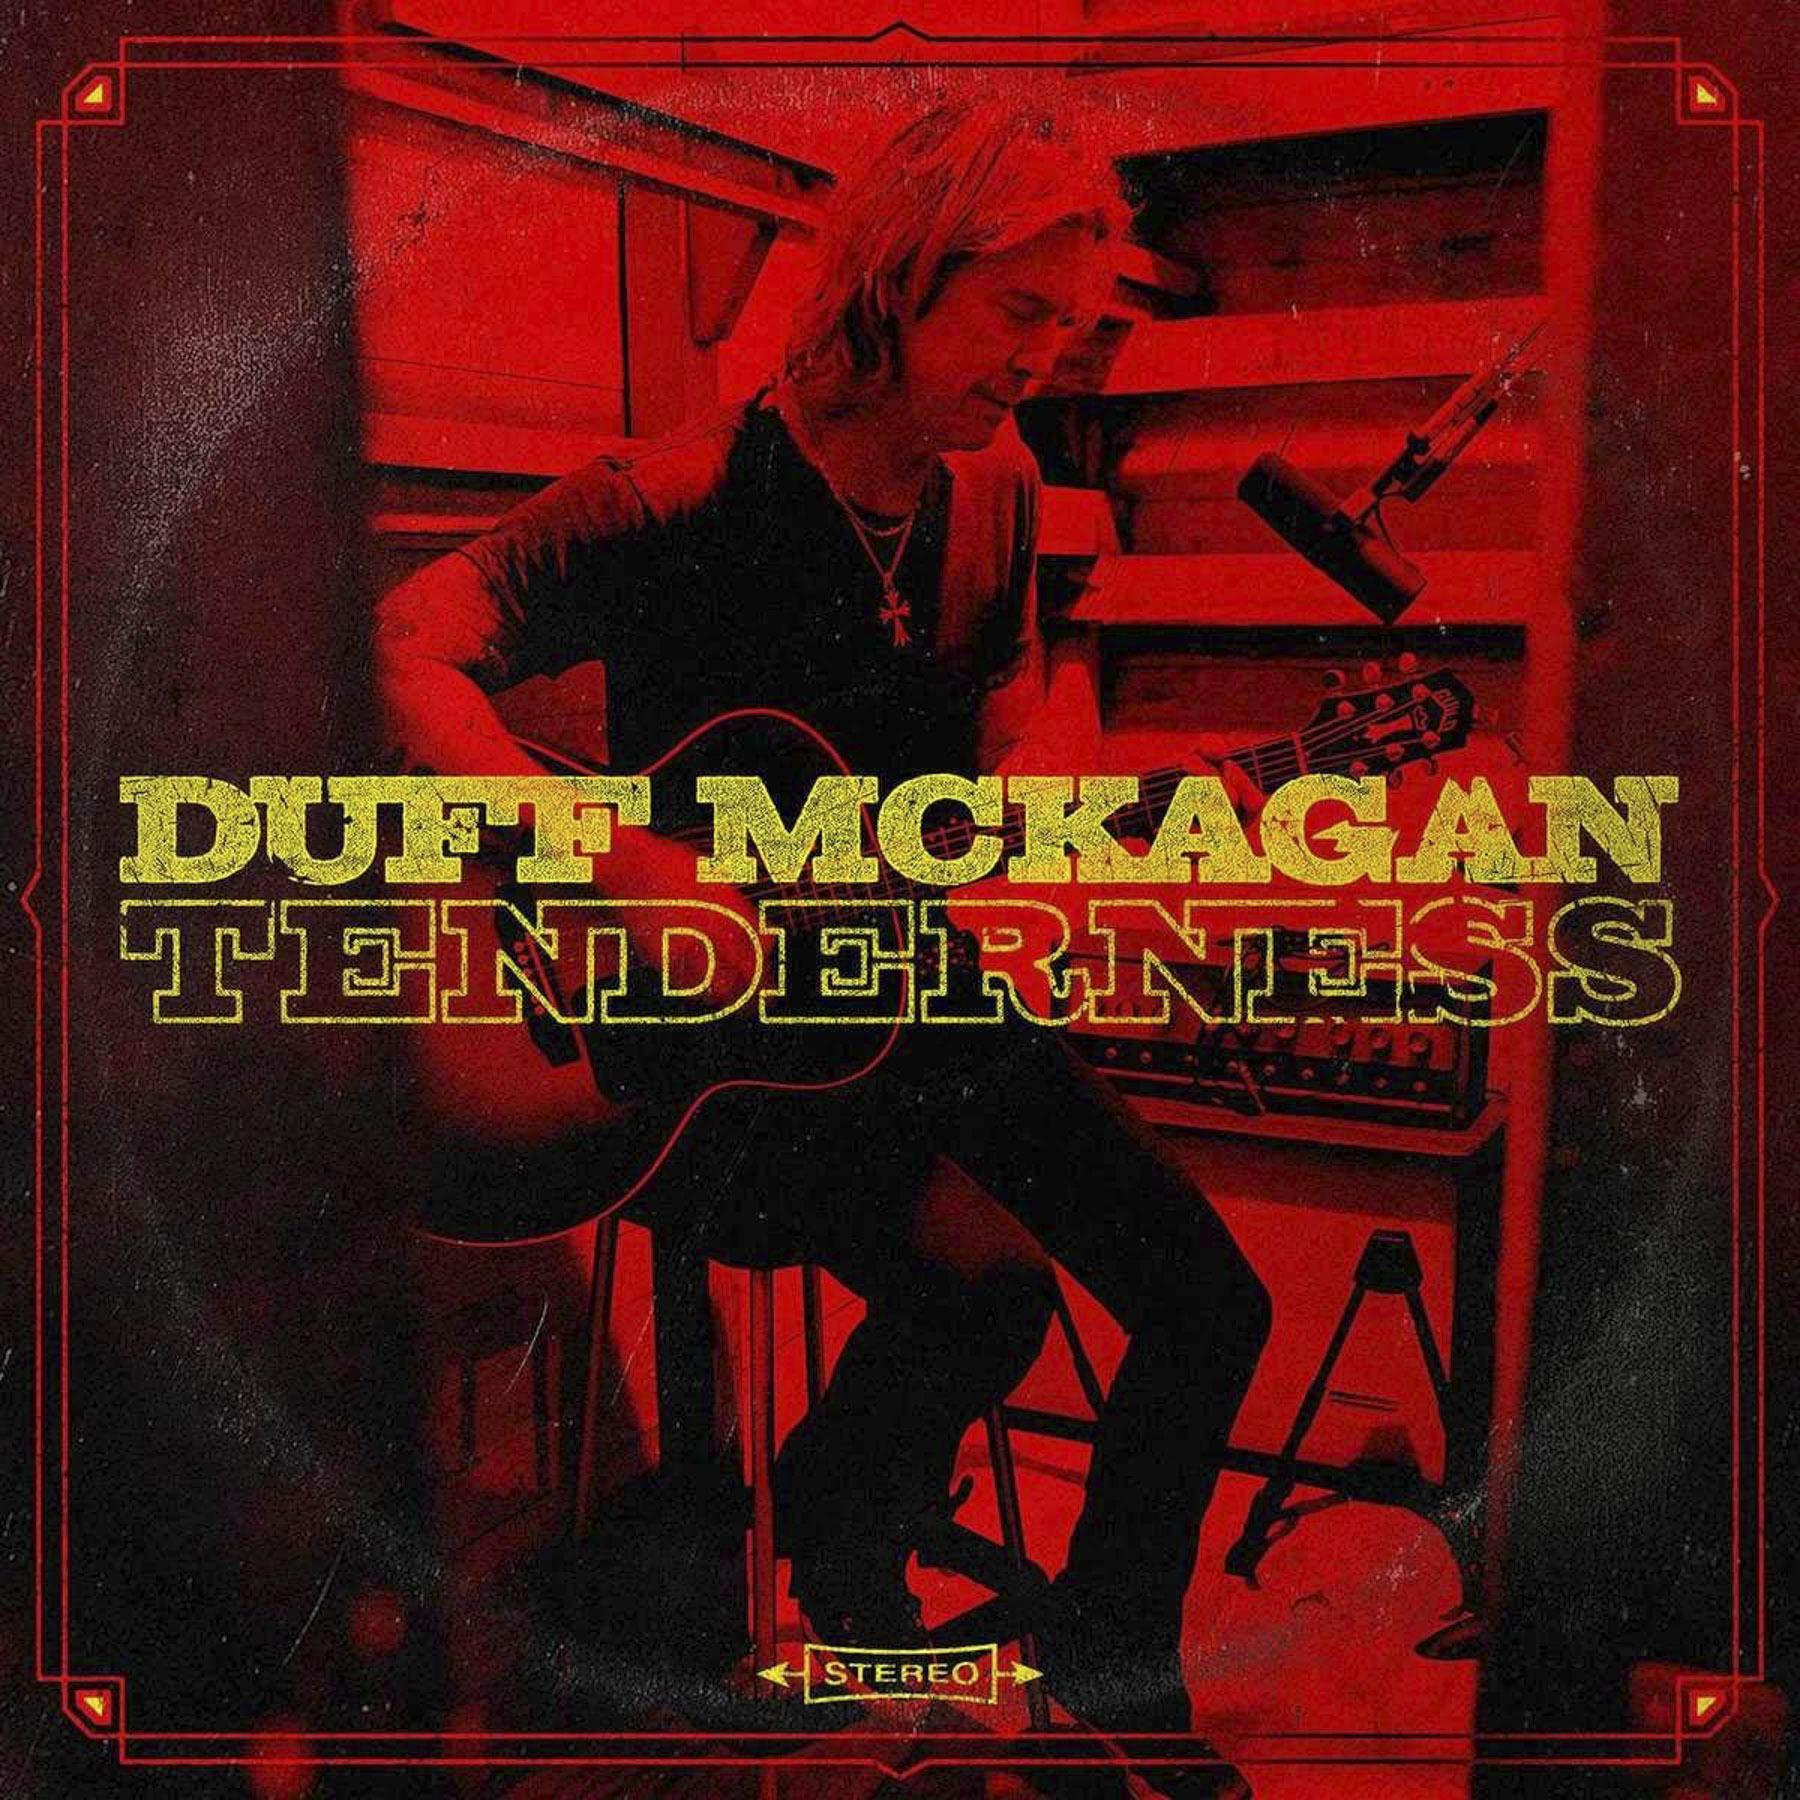 Duff McKagan 'Tenderness' album cover Release Date: May 31, 2019 Label: UMe